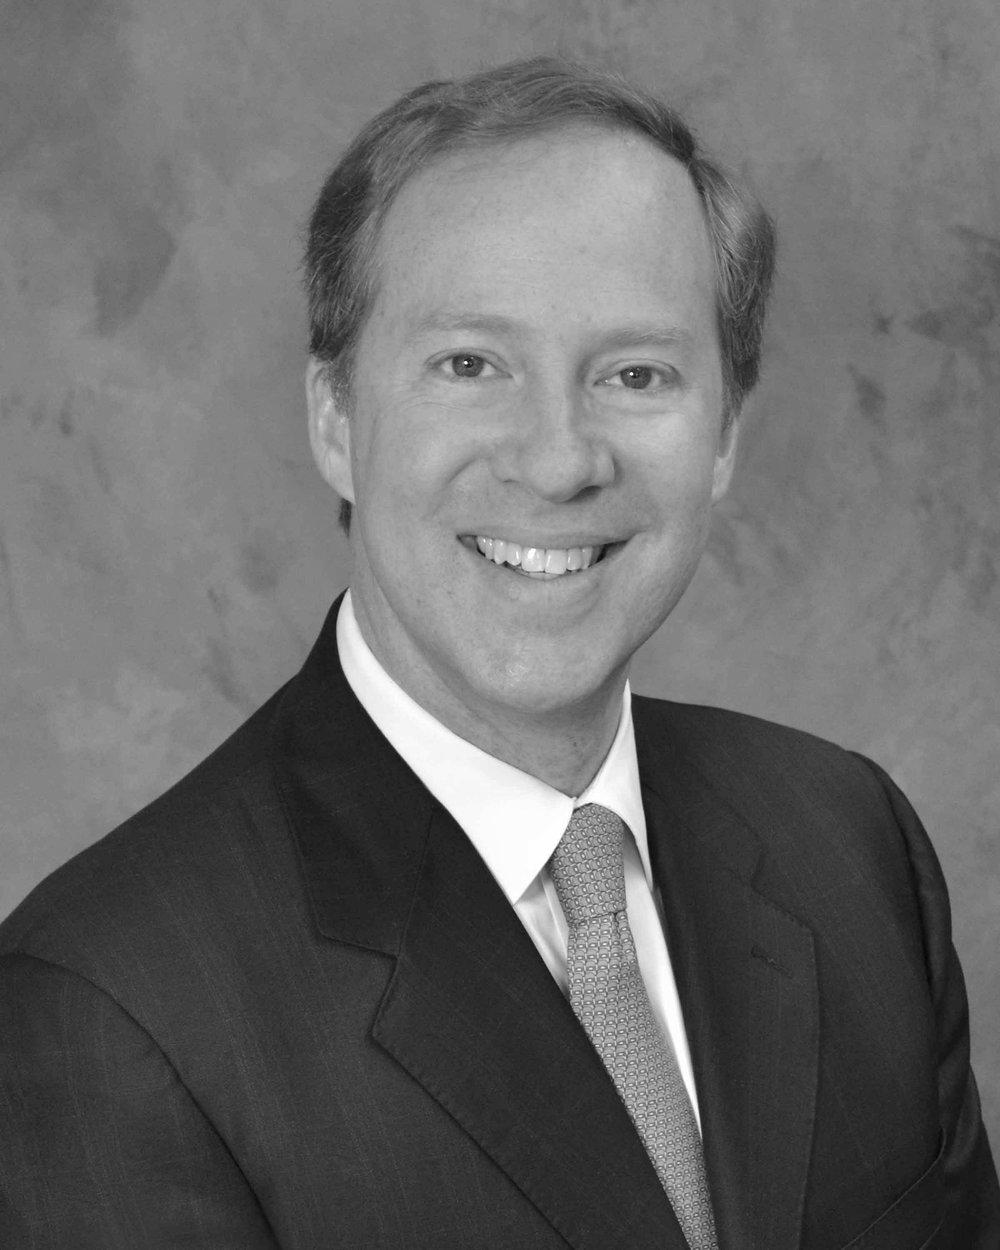 Matthew Dearth - Expertise: Investment ManagementLinkedIn Profile